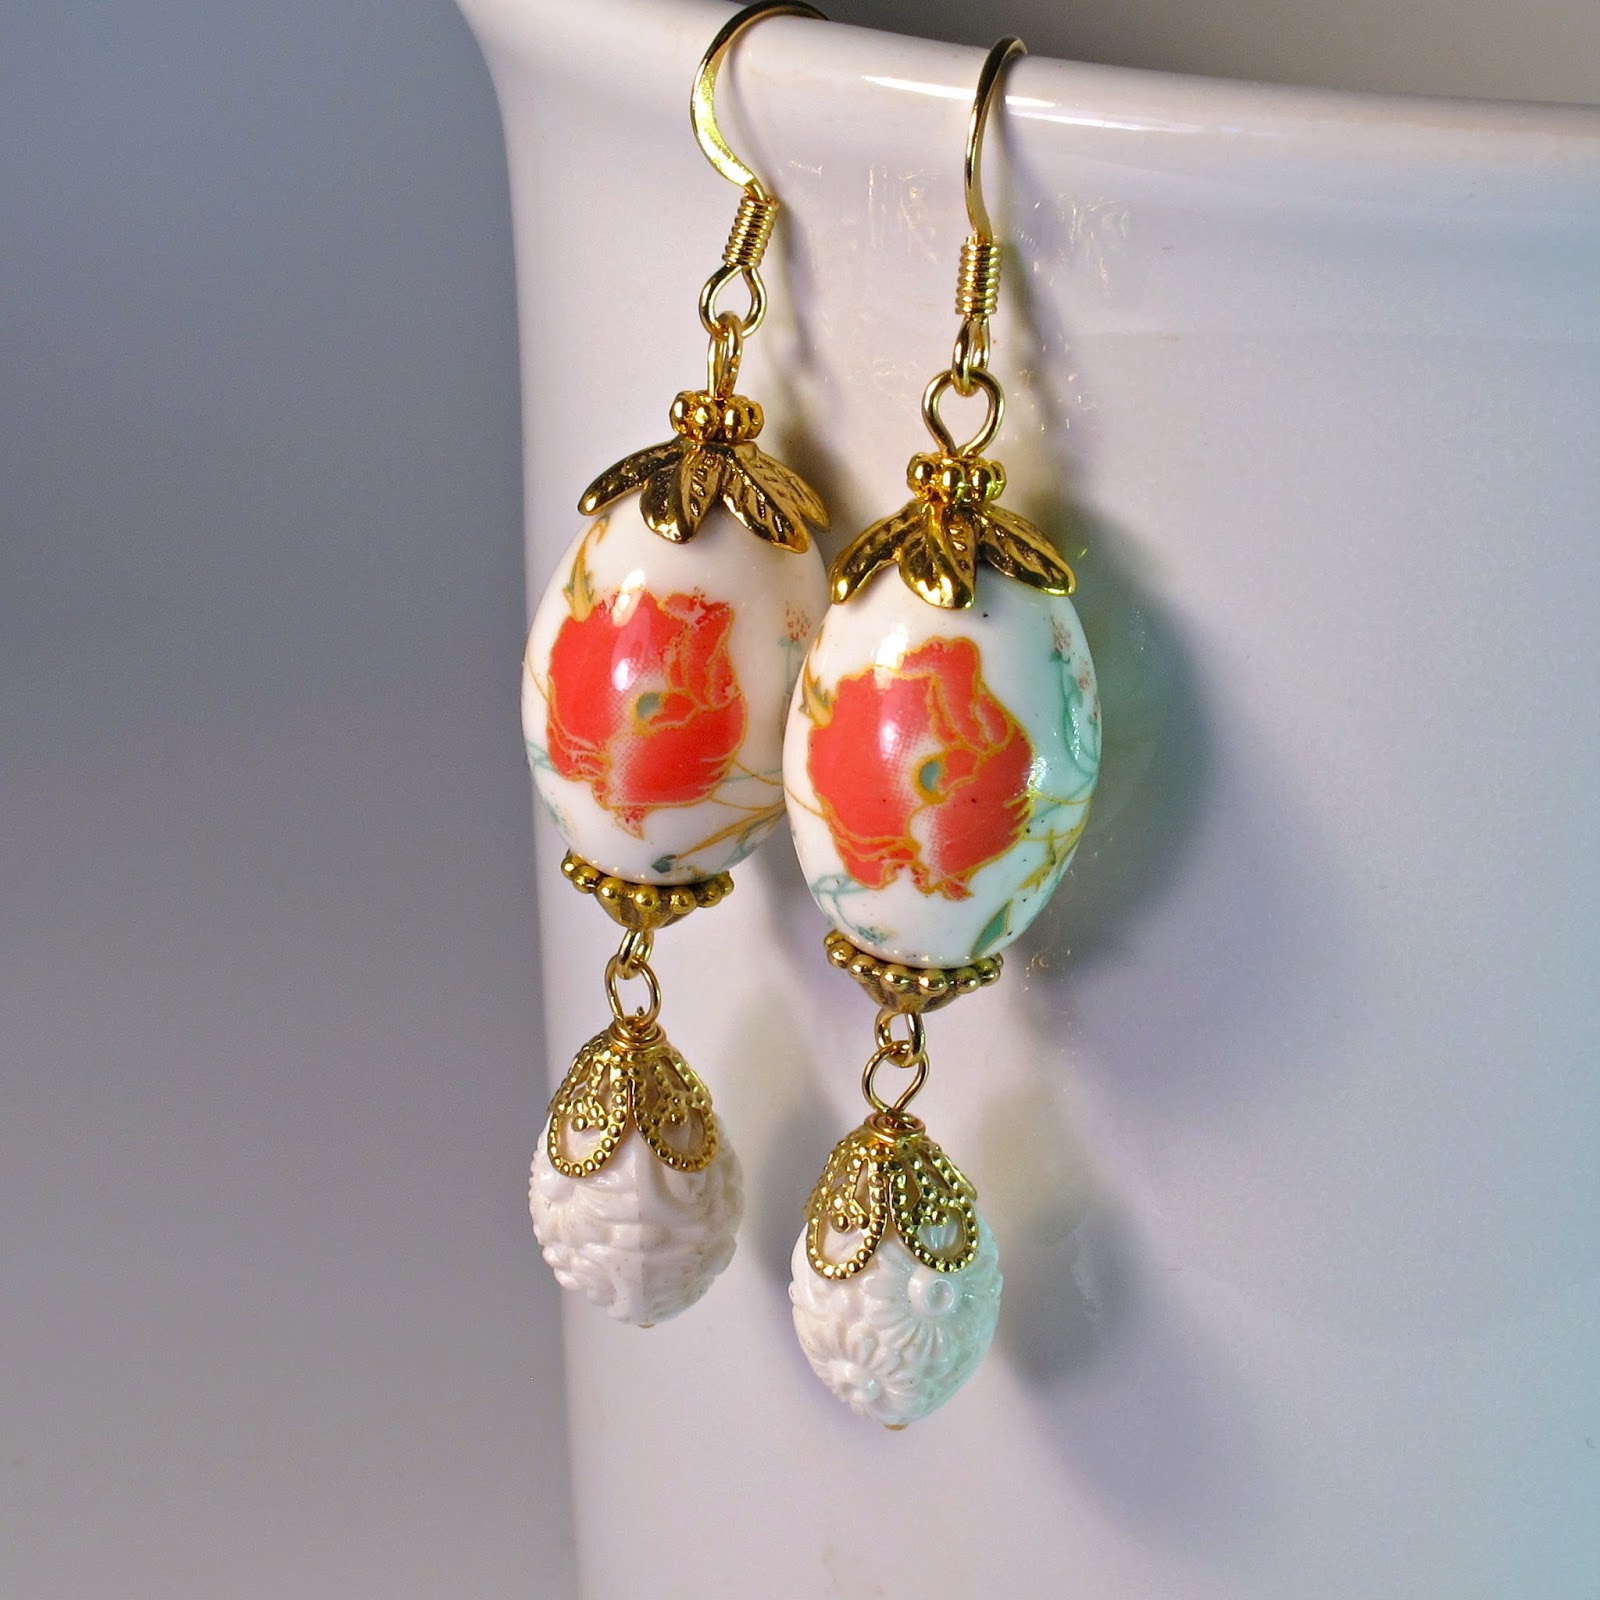 https://www.etsy.com/listing/205100209/dangling-bead-earrings-orange-poppy?ref=shop_home_active_3